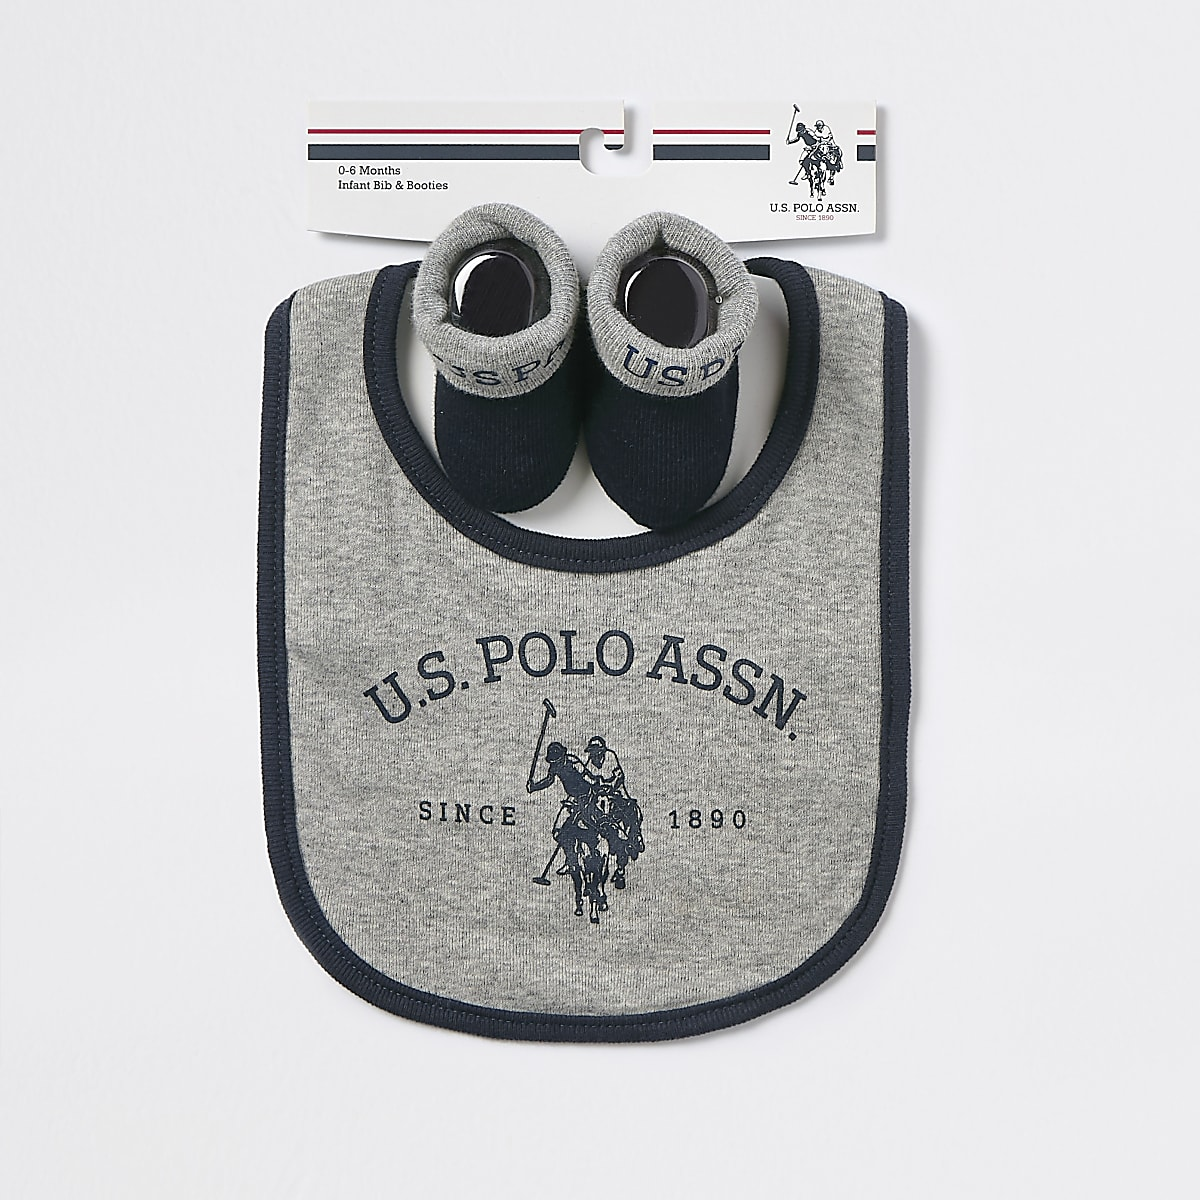 Baby U.S. POLO ASSN. grey bib set